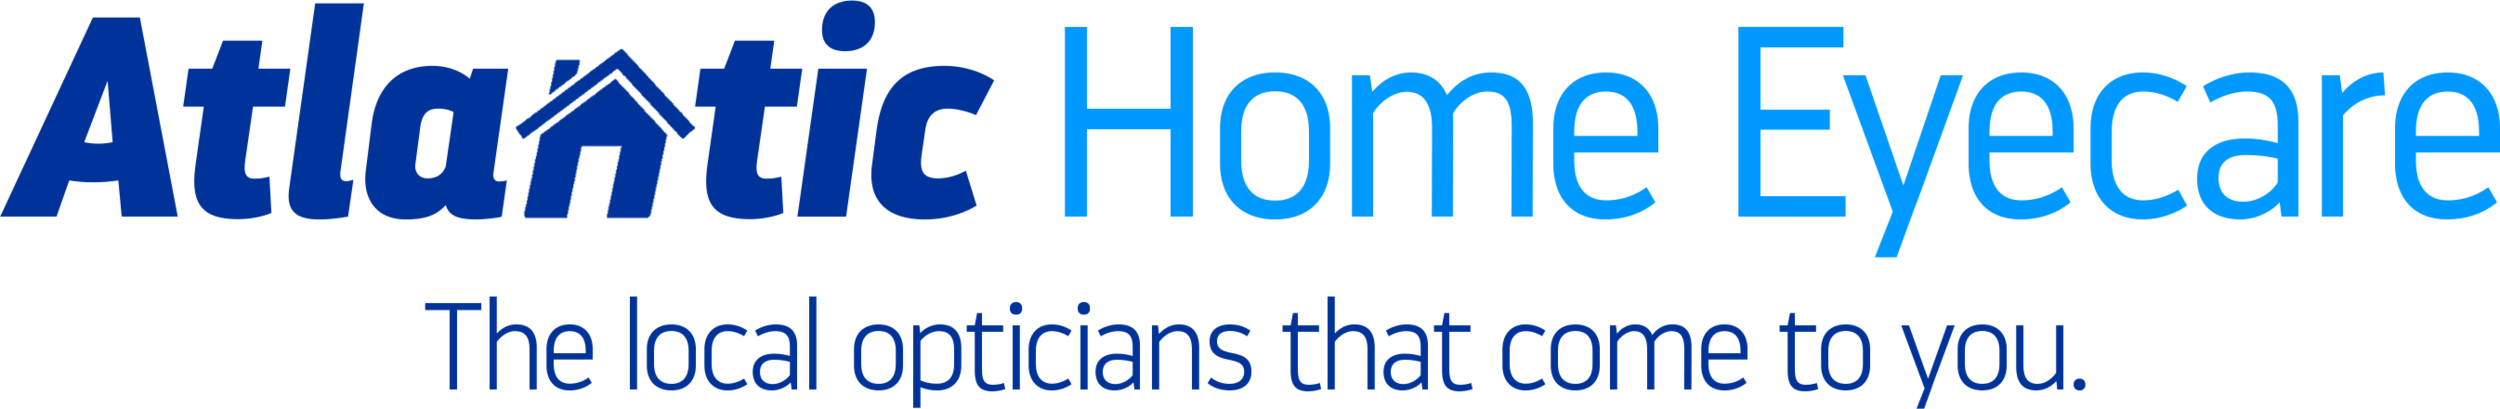 Atlantic Home Eyecare